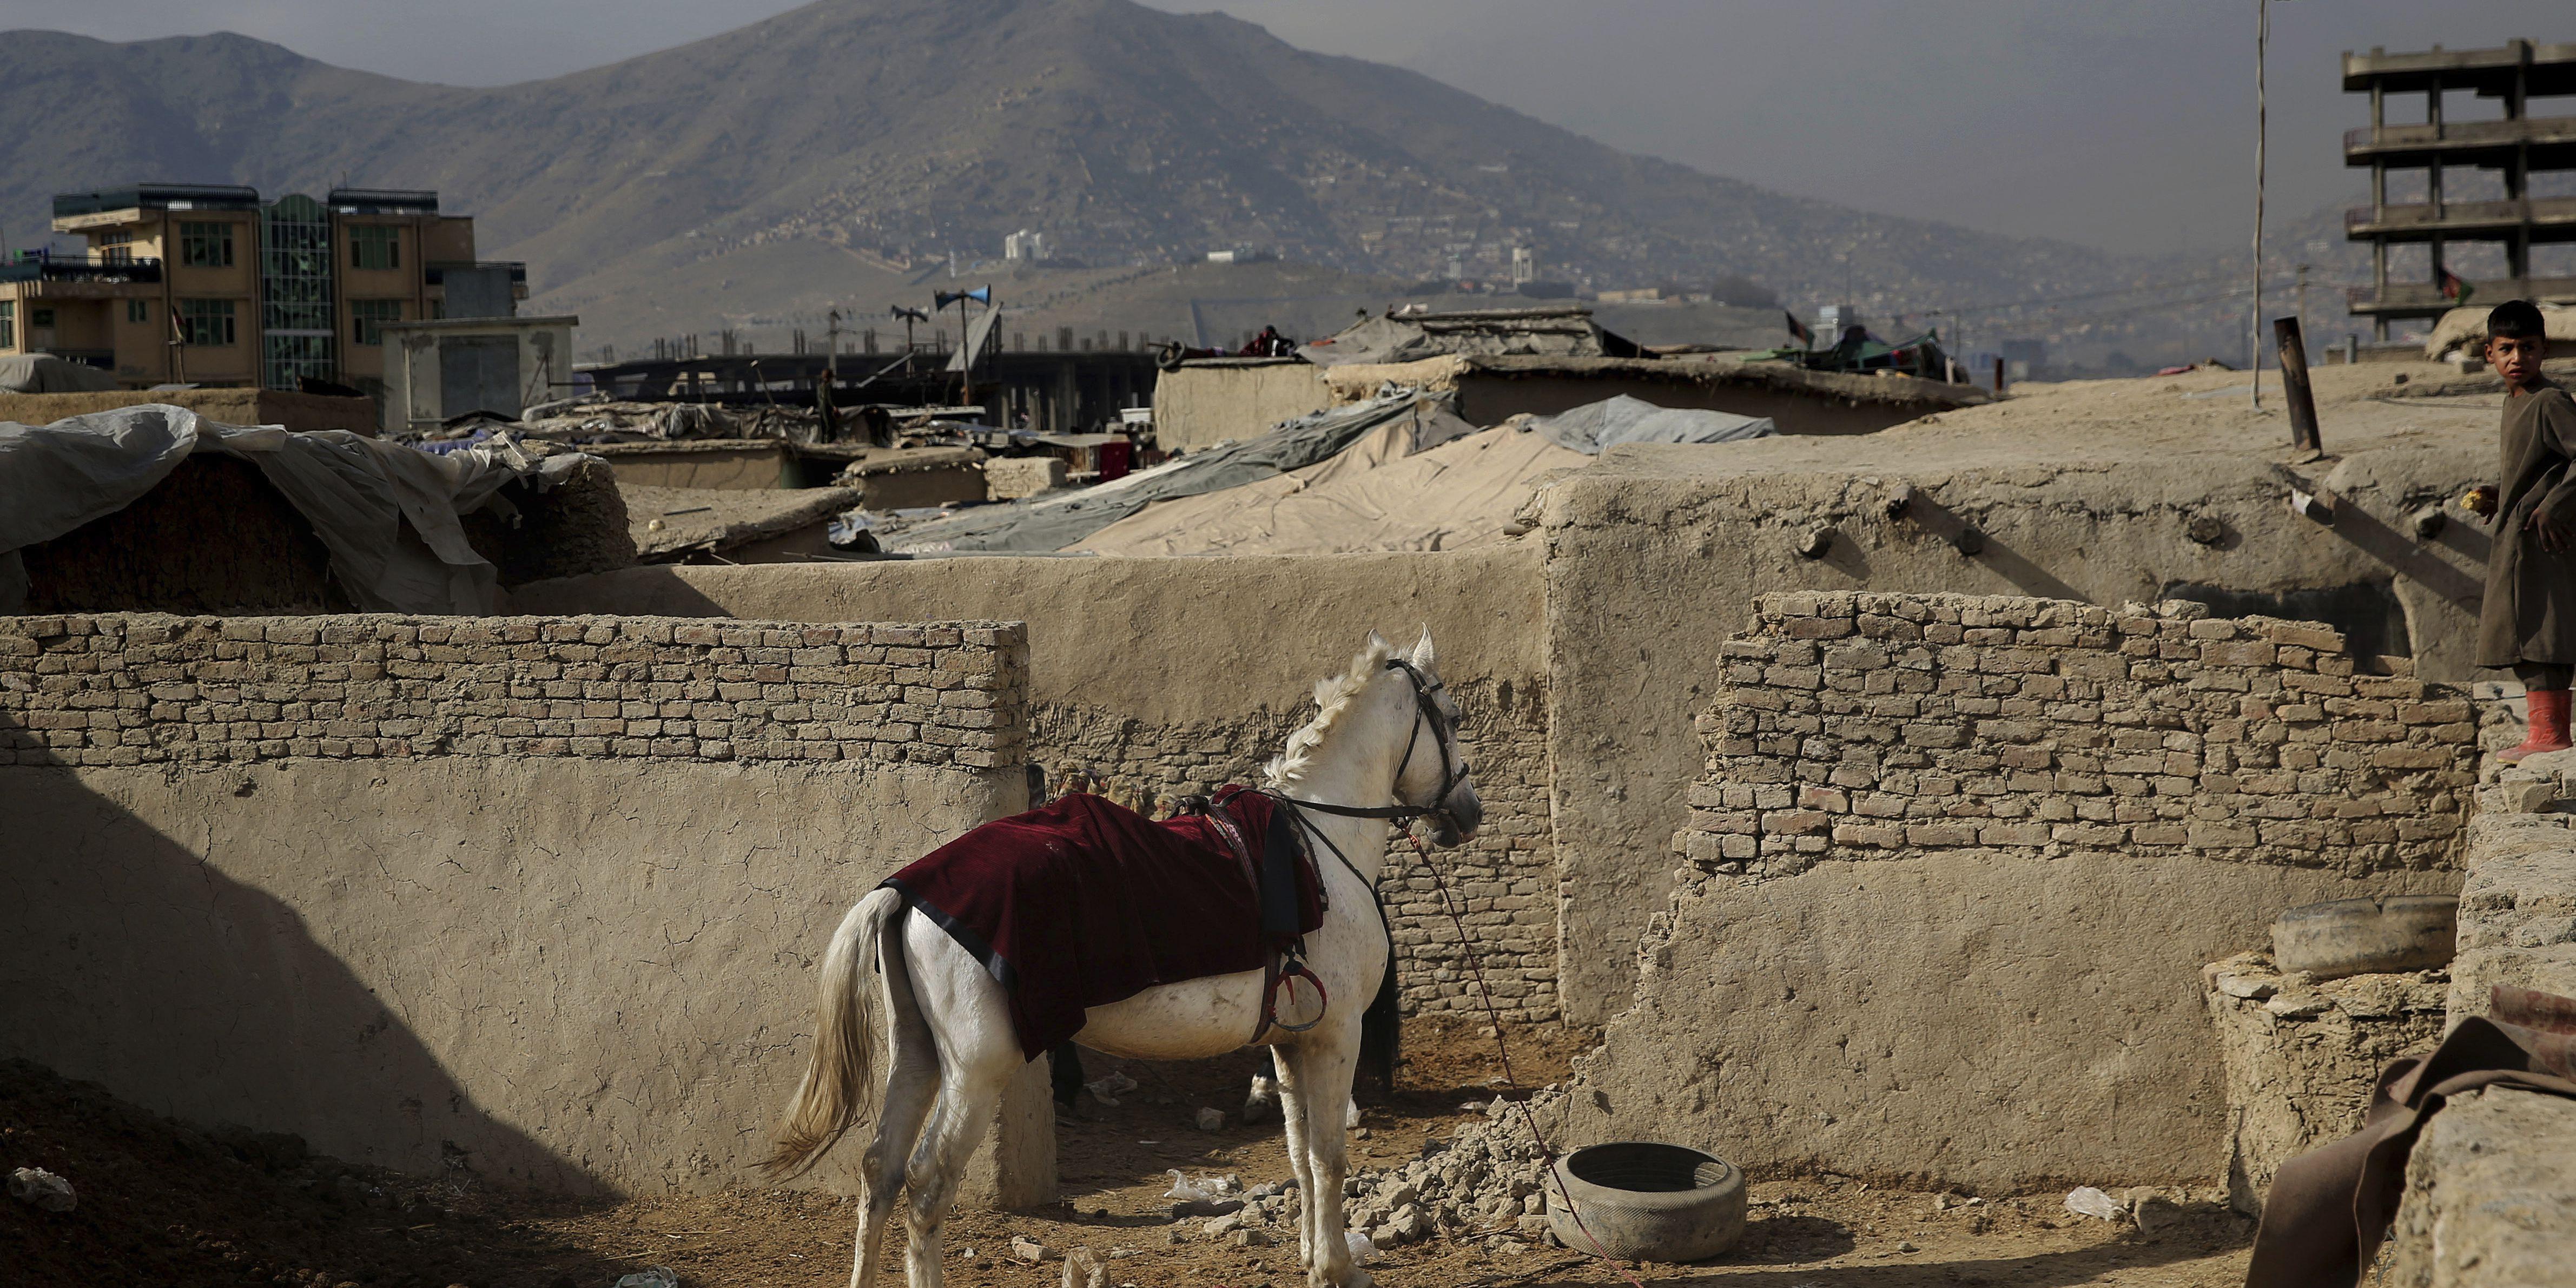 Report: US misled public on progress in Afghanistan war